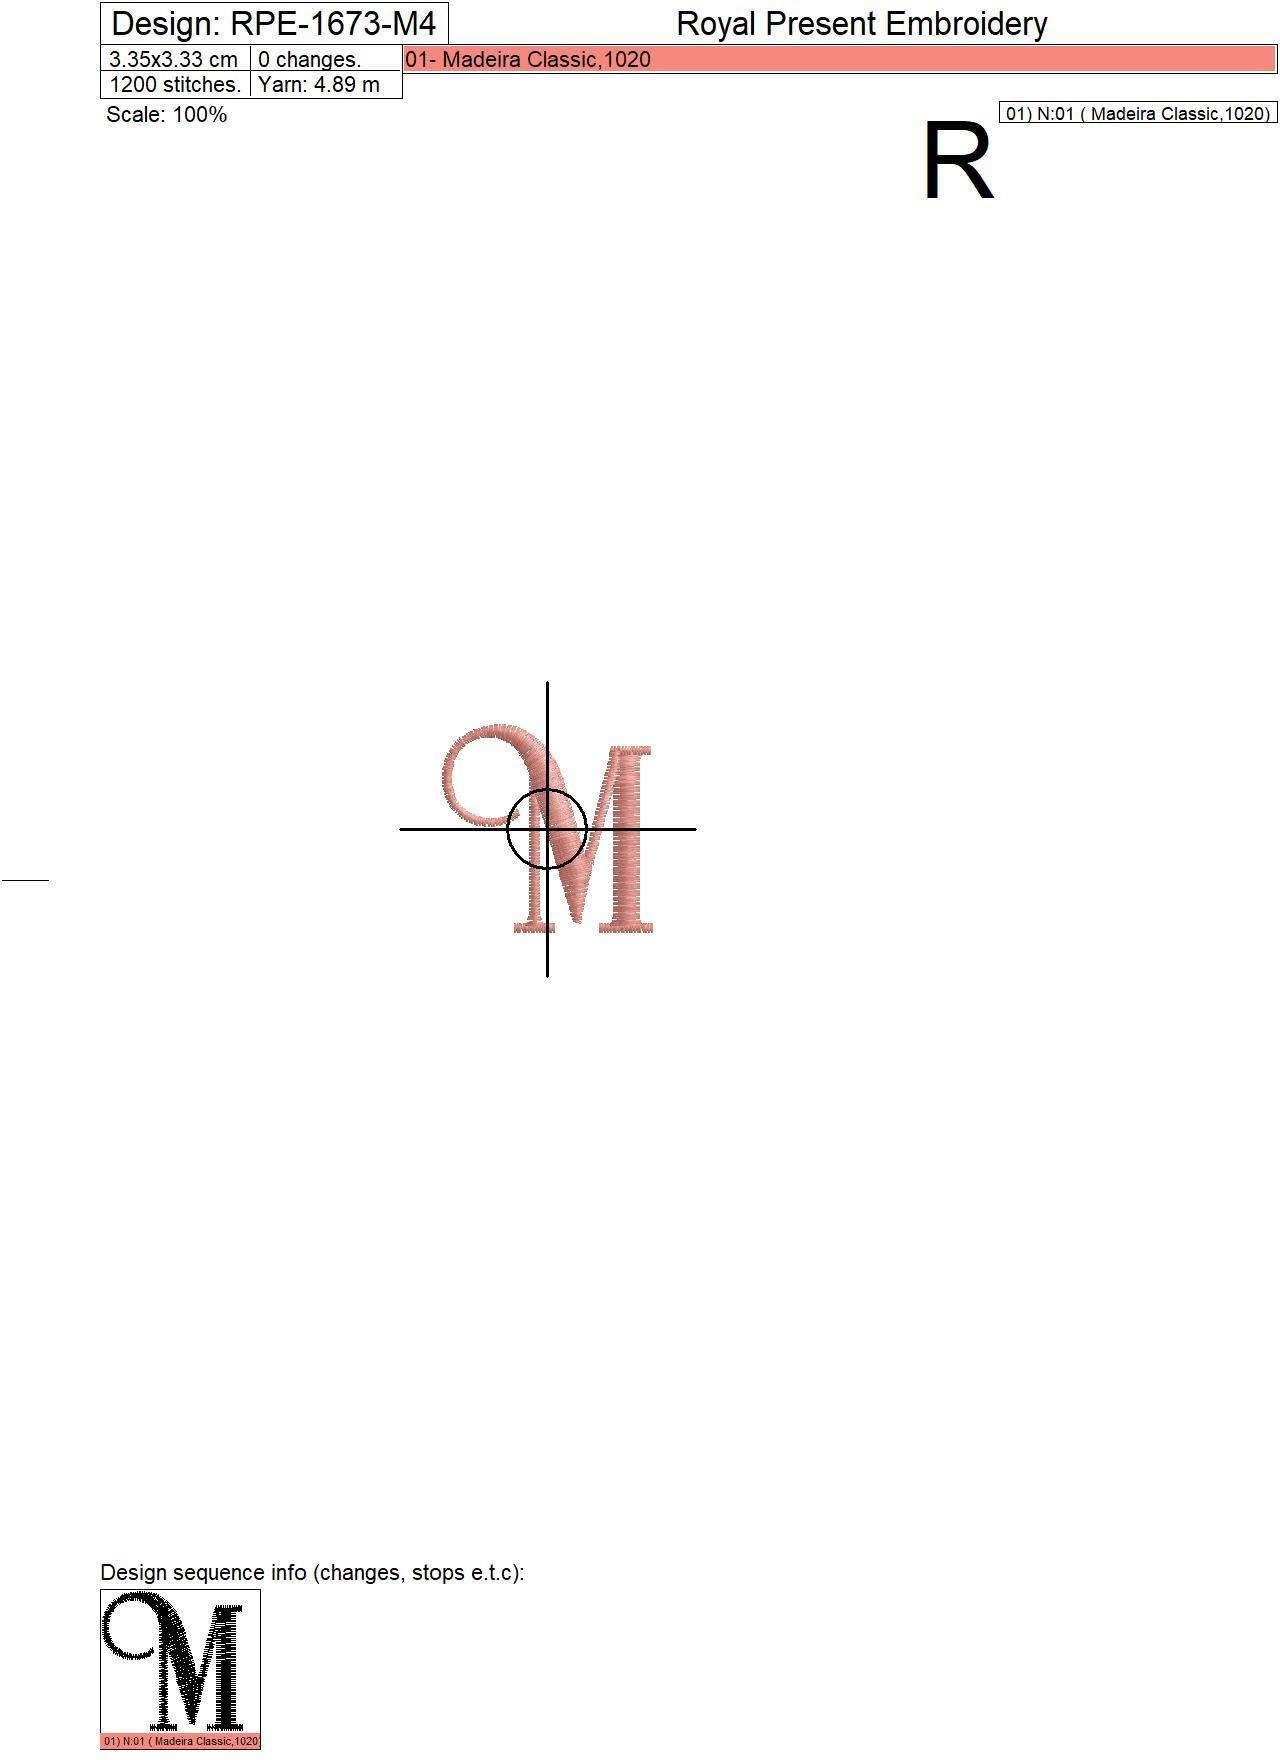 Capital Letter M Embroidery design V4